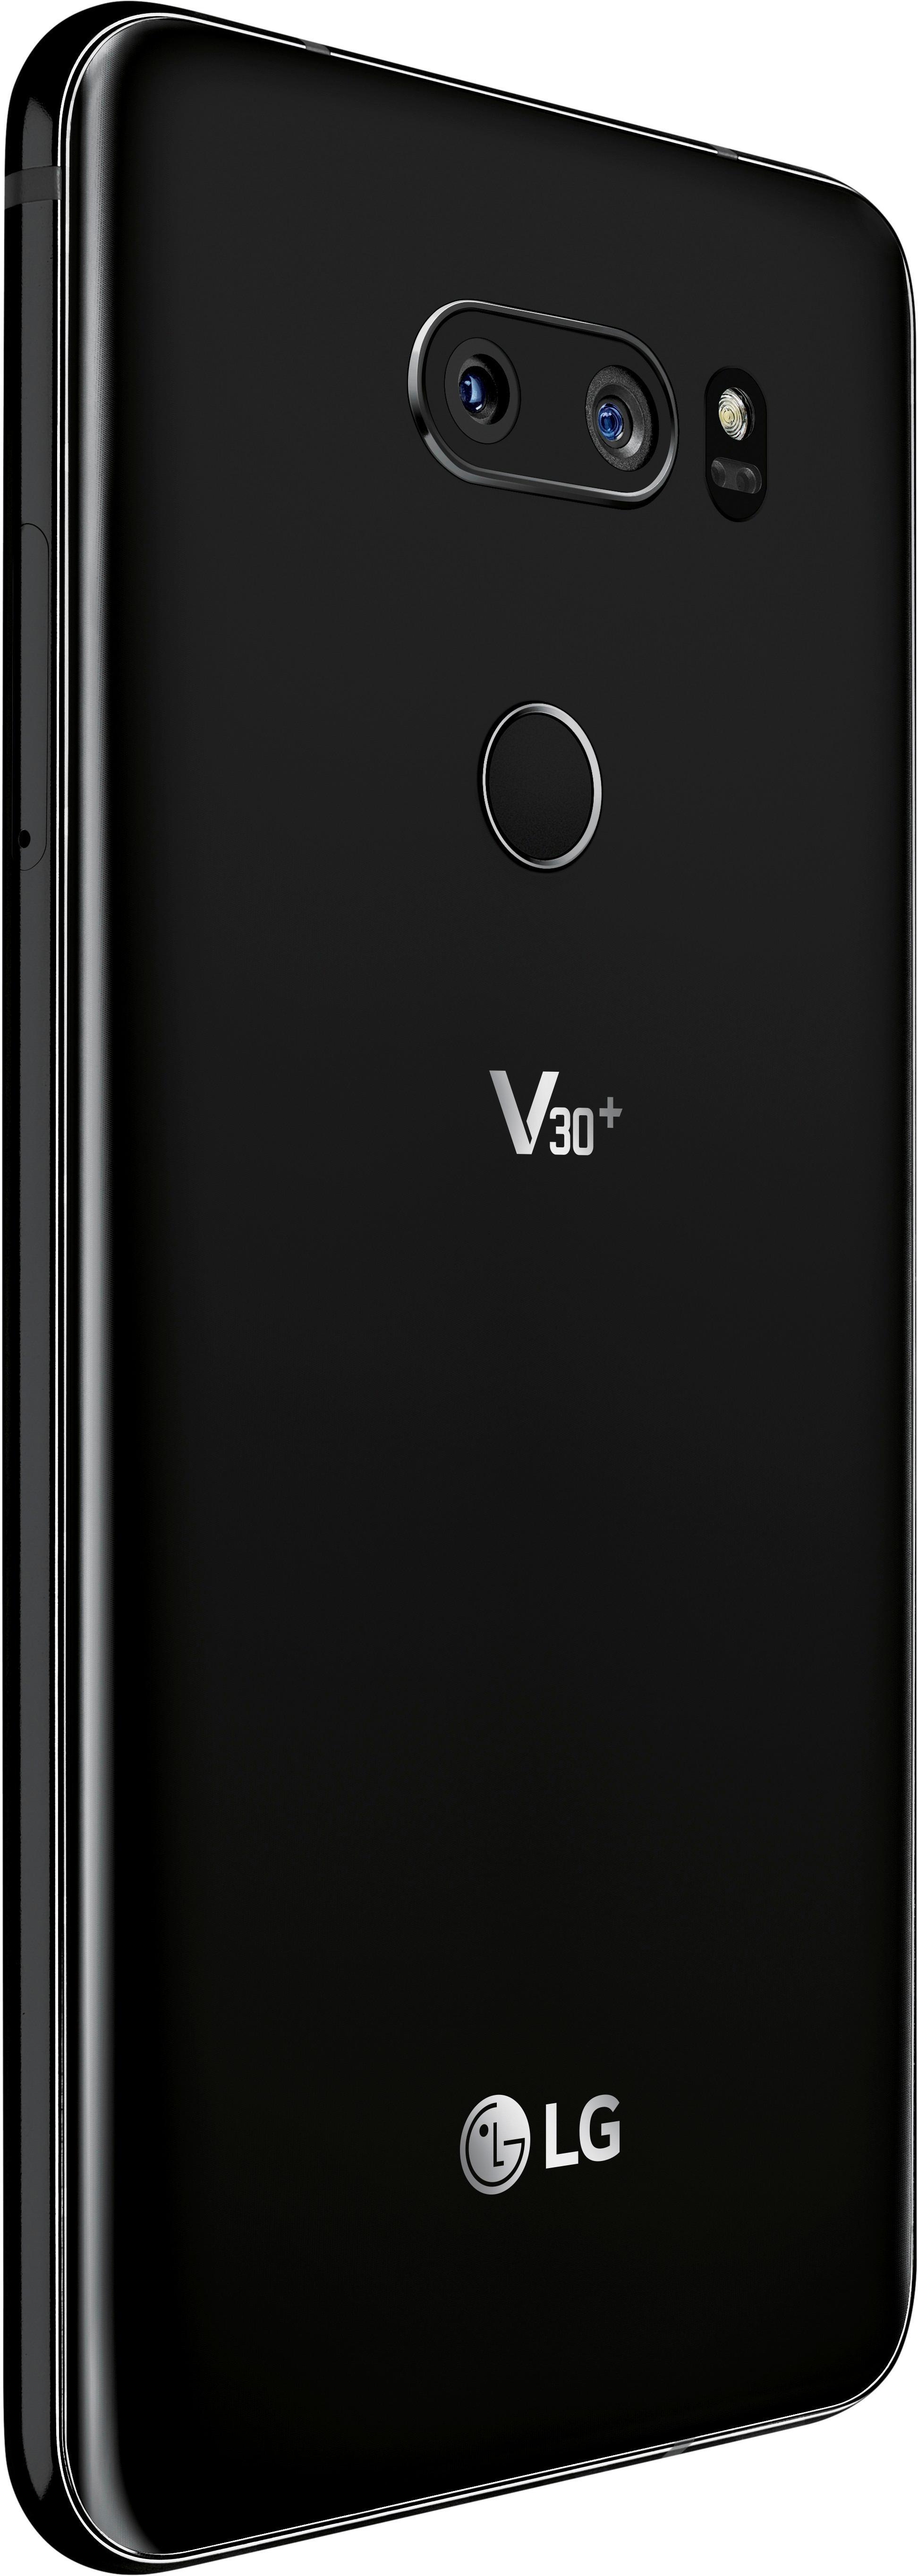 1944x5456 Lg V30  With 128gb Memory Cell Phone Black Lgls9982blk